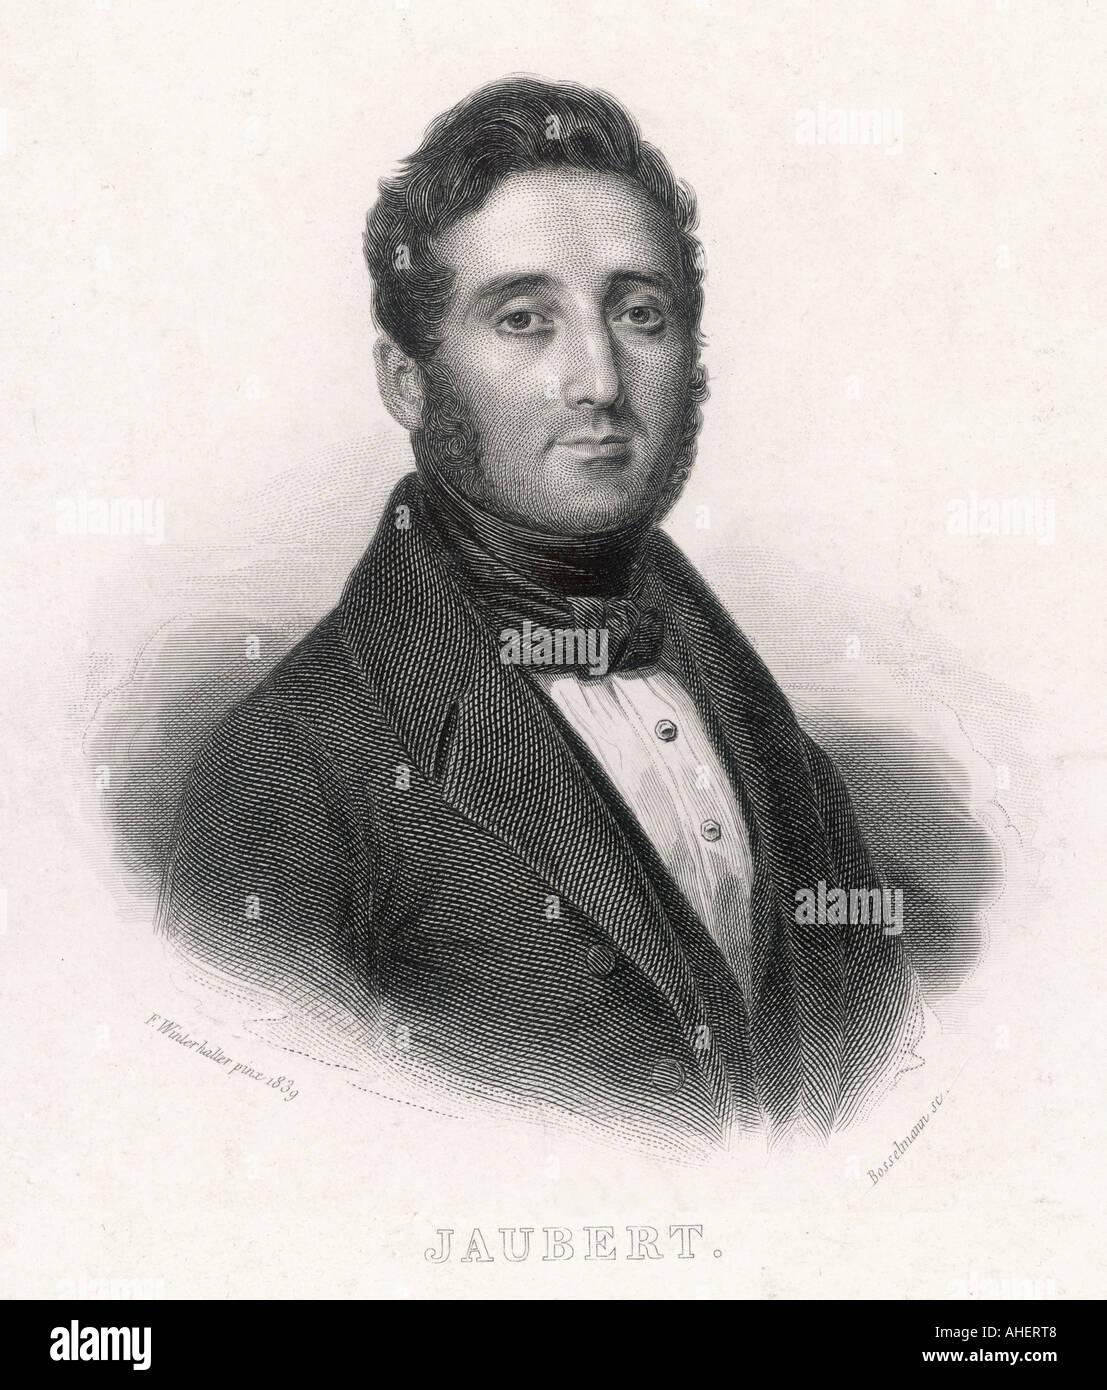 Pierre Jaubert Stockbild